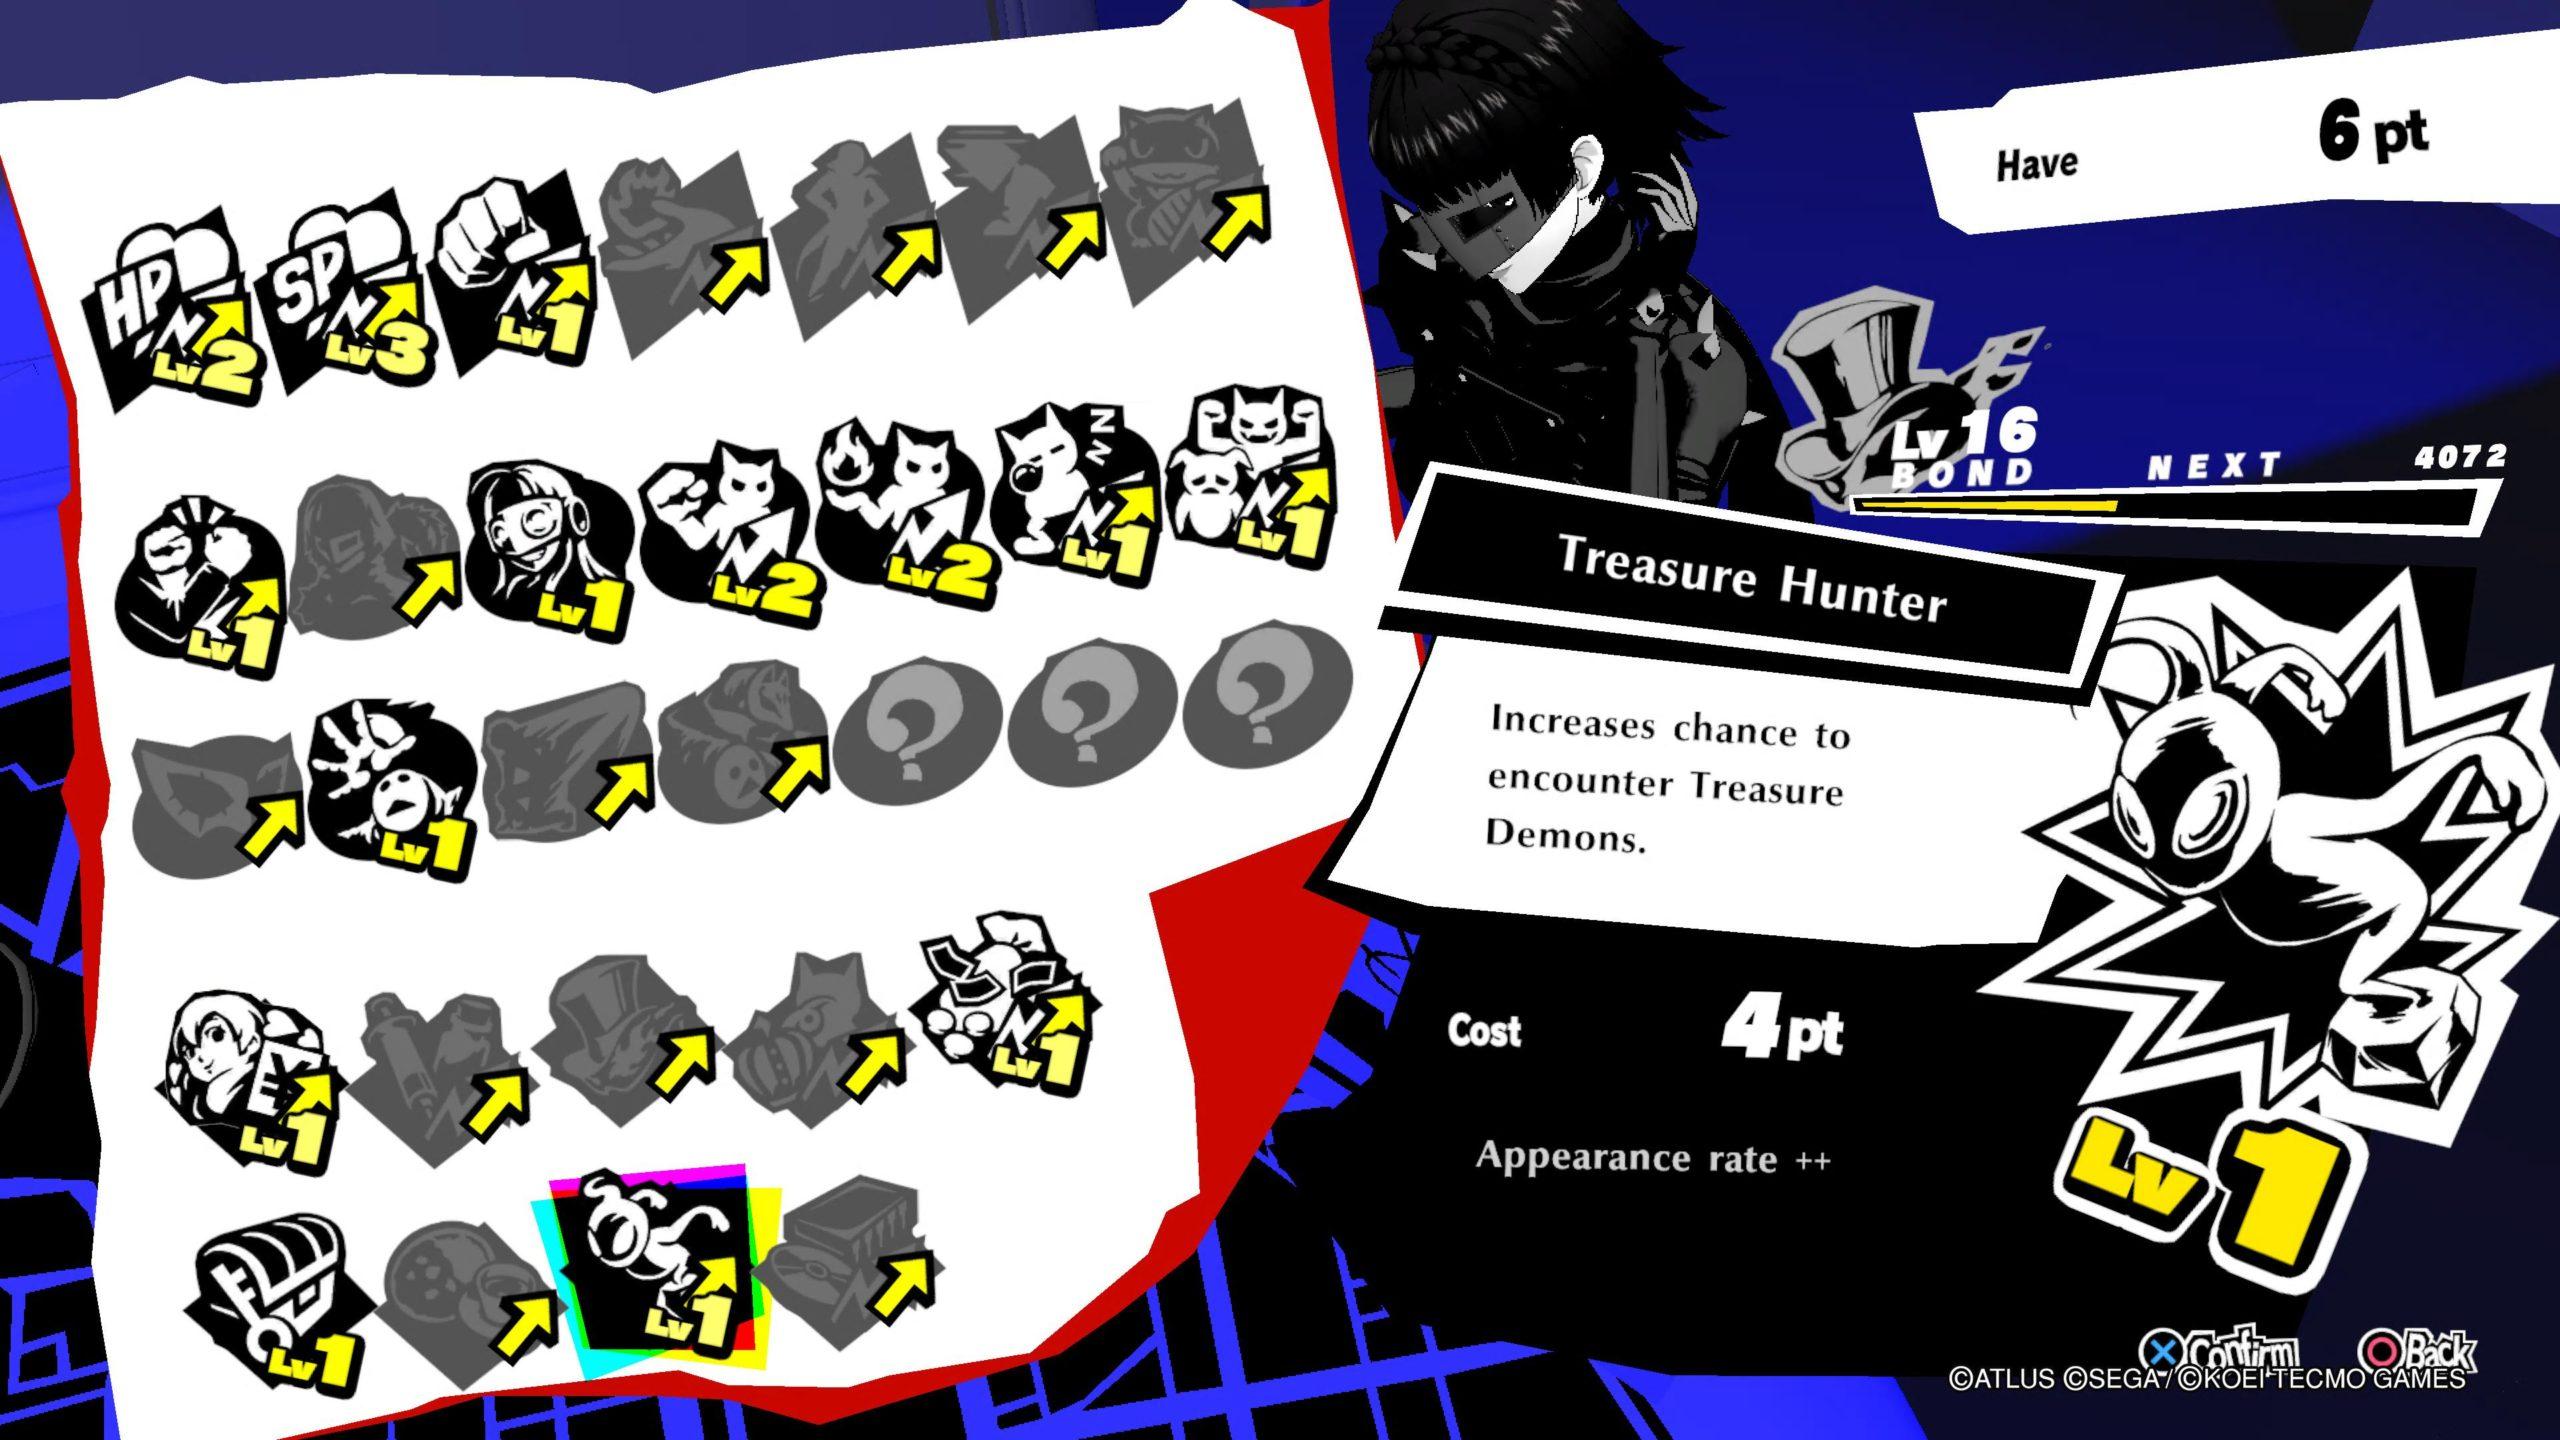 Persona 5 Strikers Treasure Hunter Bond